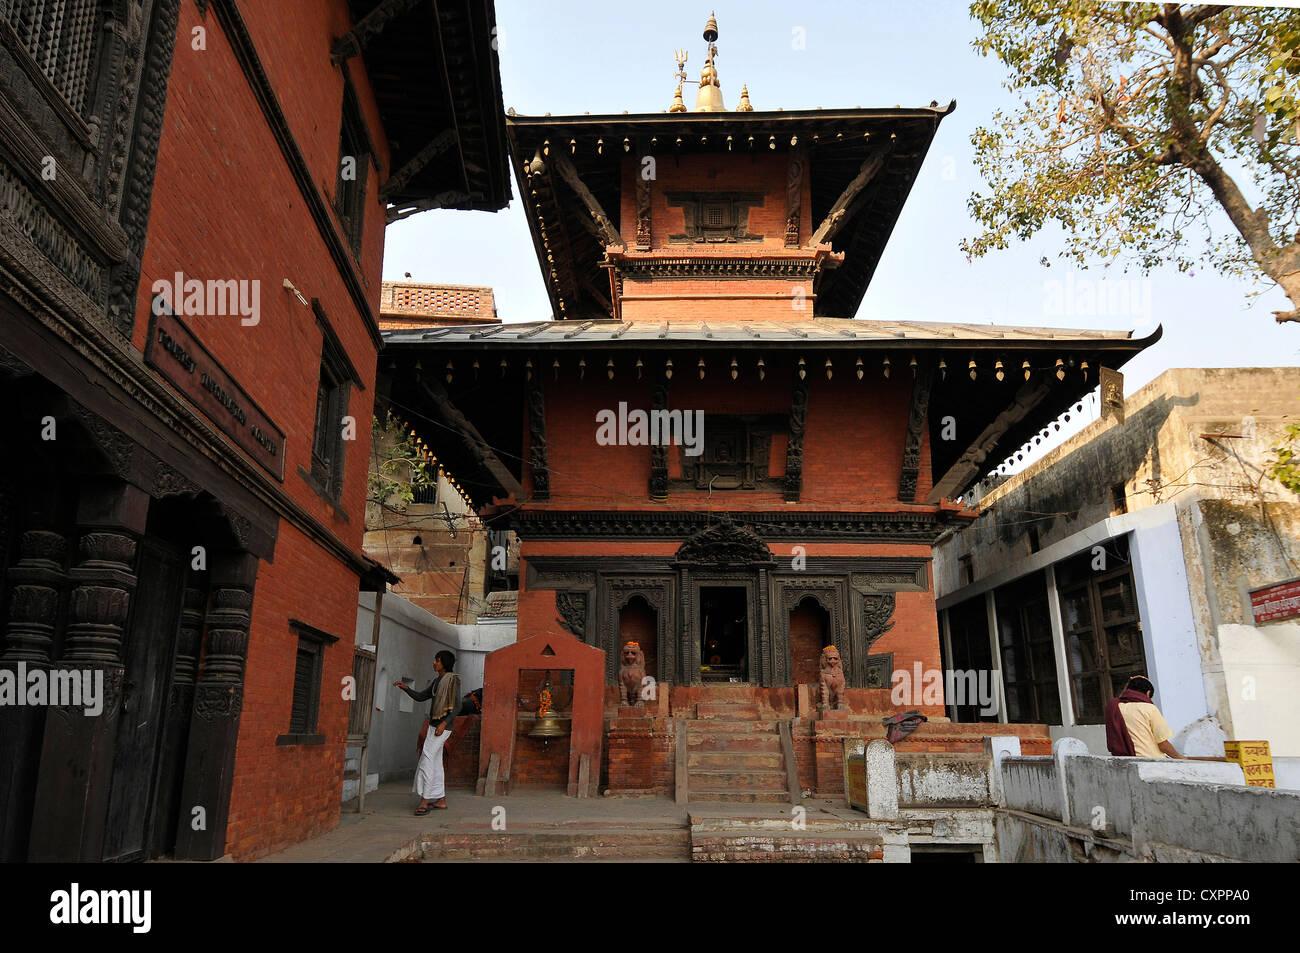 Asia India Uttar Pradesh Varanasi a Nepali Hindu Temple - Stock Image